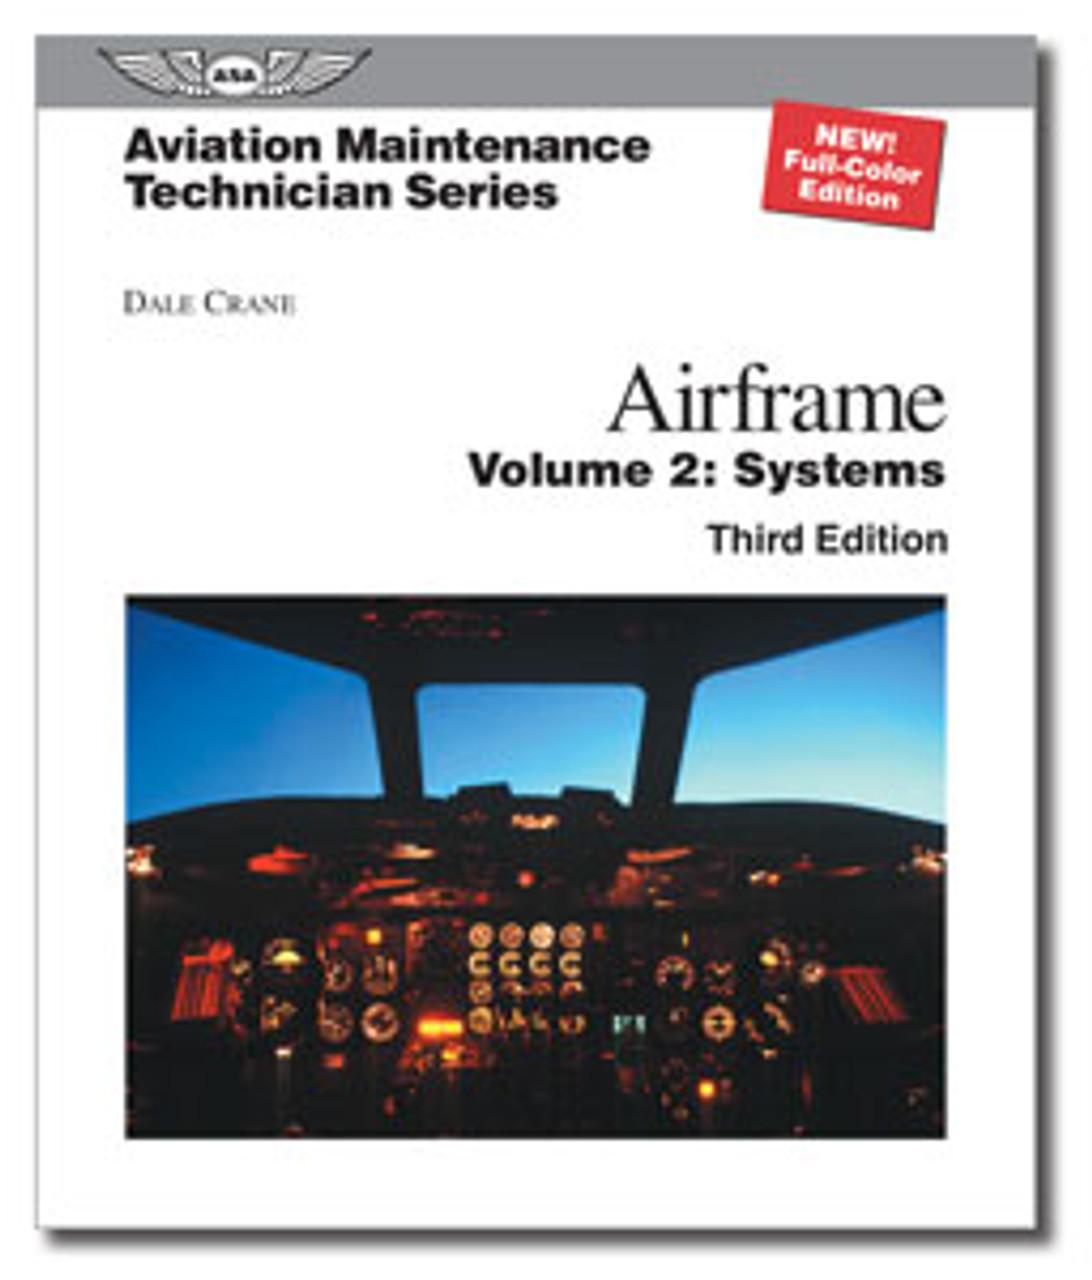 Aviation Maintenance Technician Series: Airframe Systems